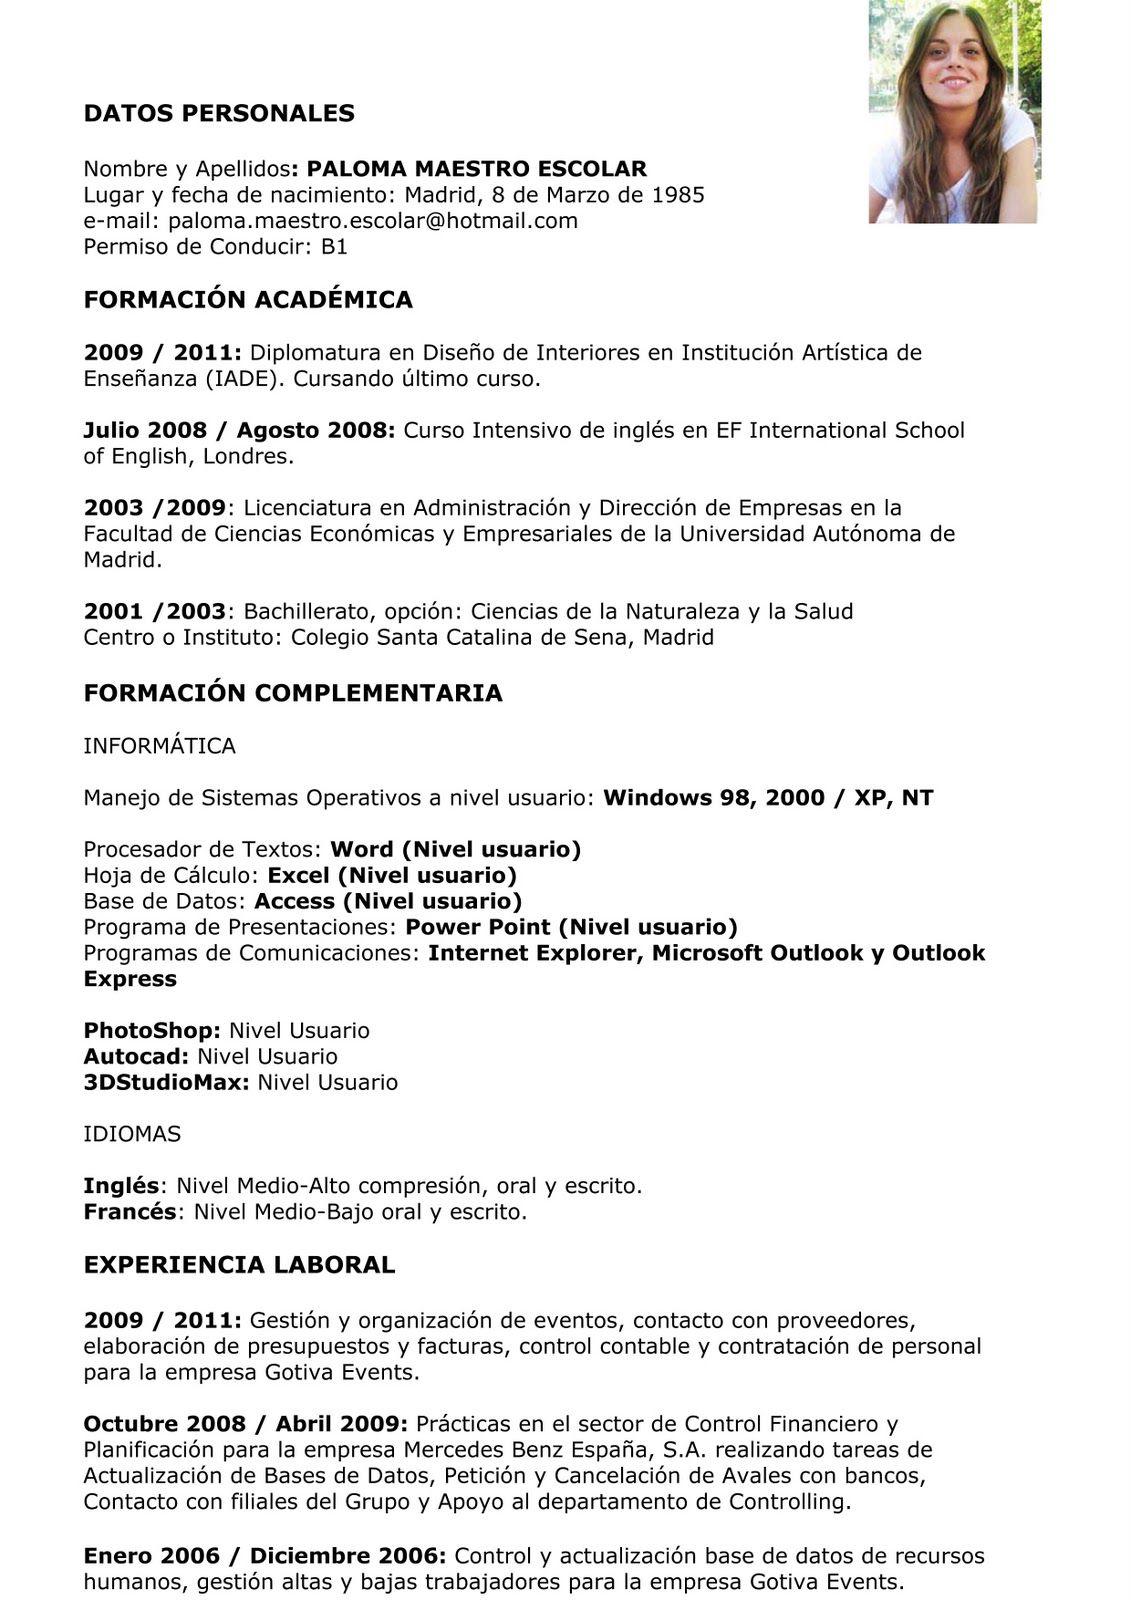 modelos de Curriculumvitae.jpg (1131×1600) Curriculum